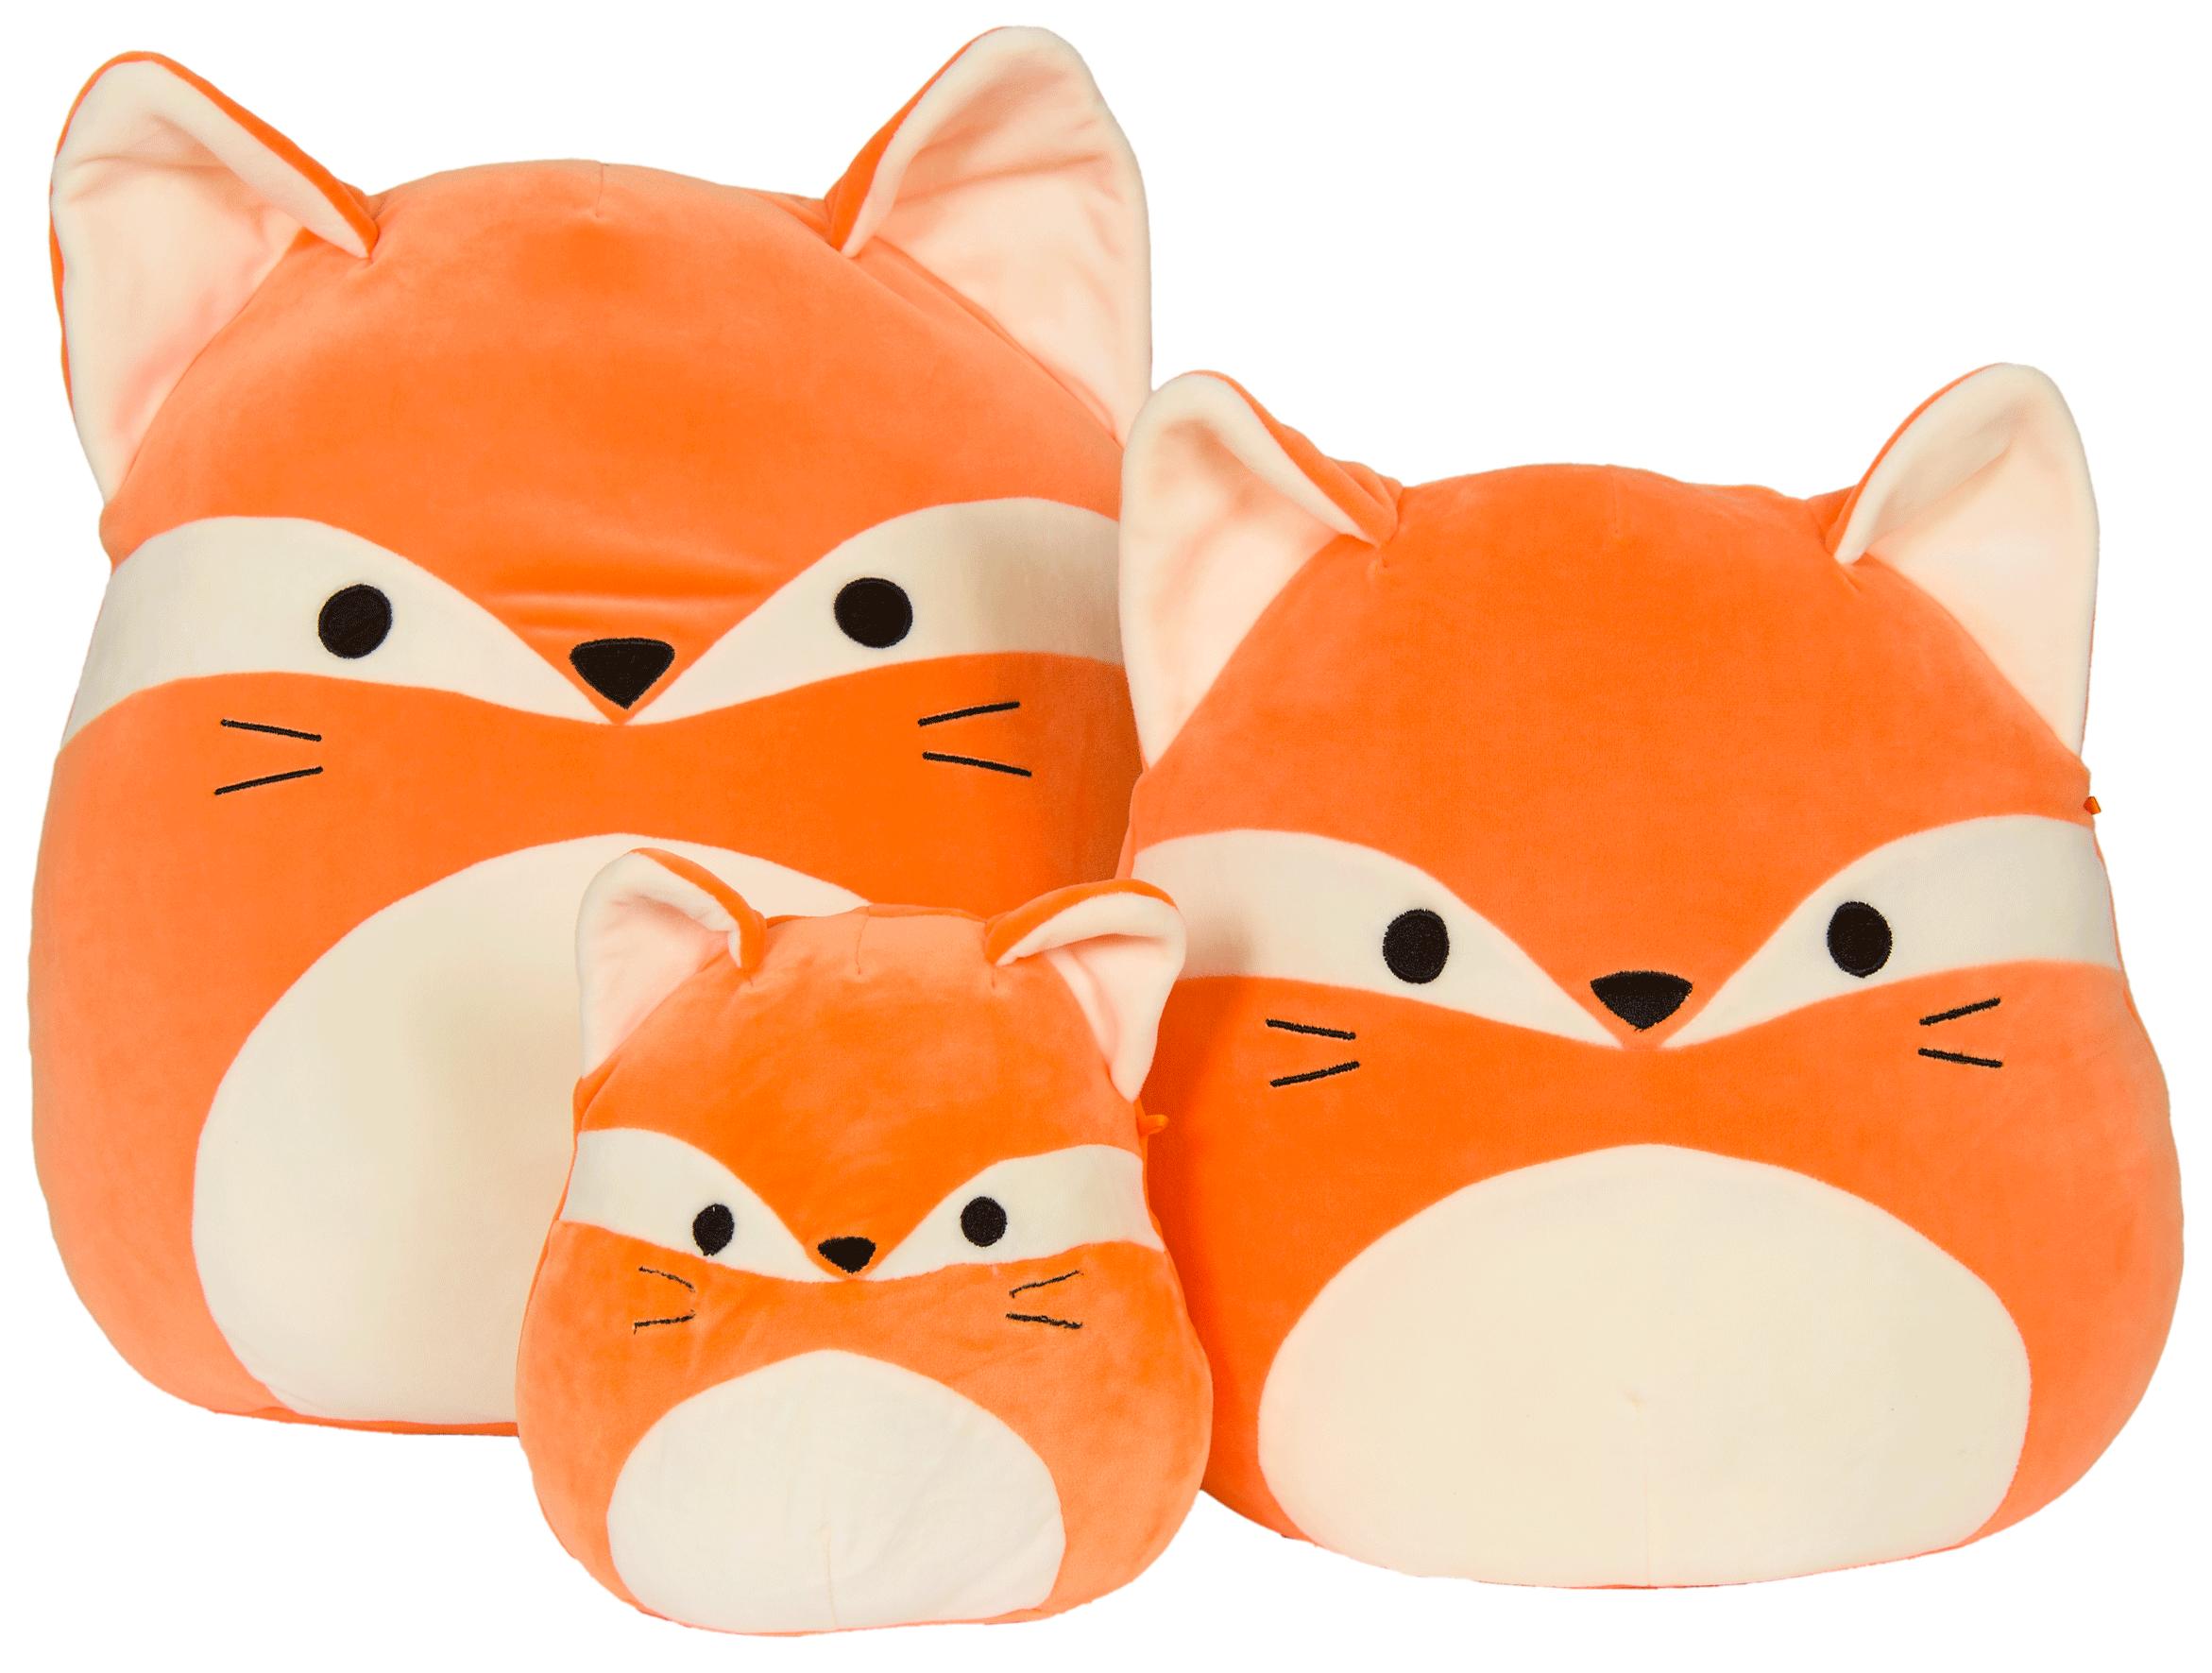 Super Soft Plush Toys Squishmallows Cute Stuffed Animals Animal Plush Toys Animal Pillows